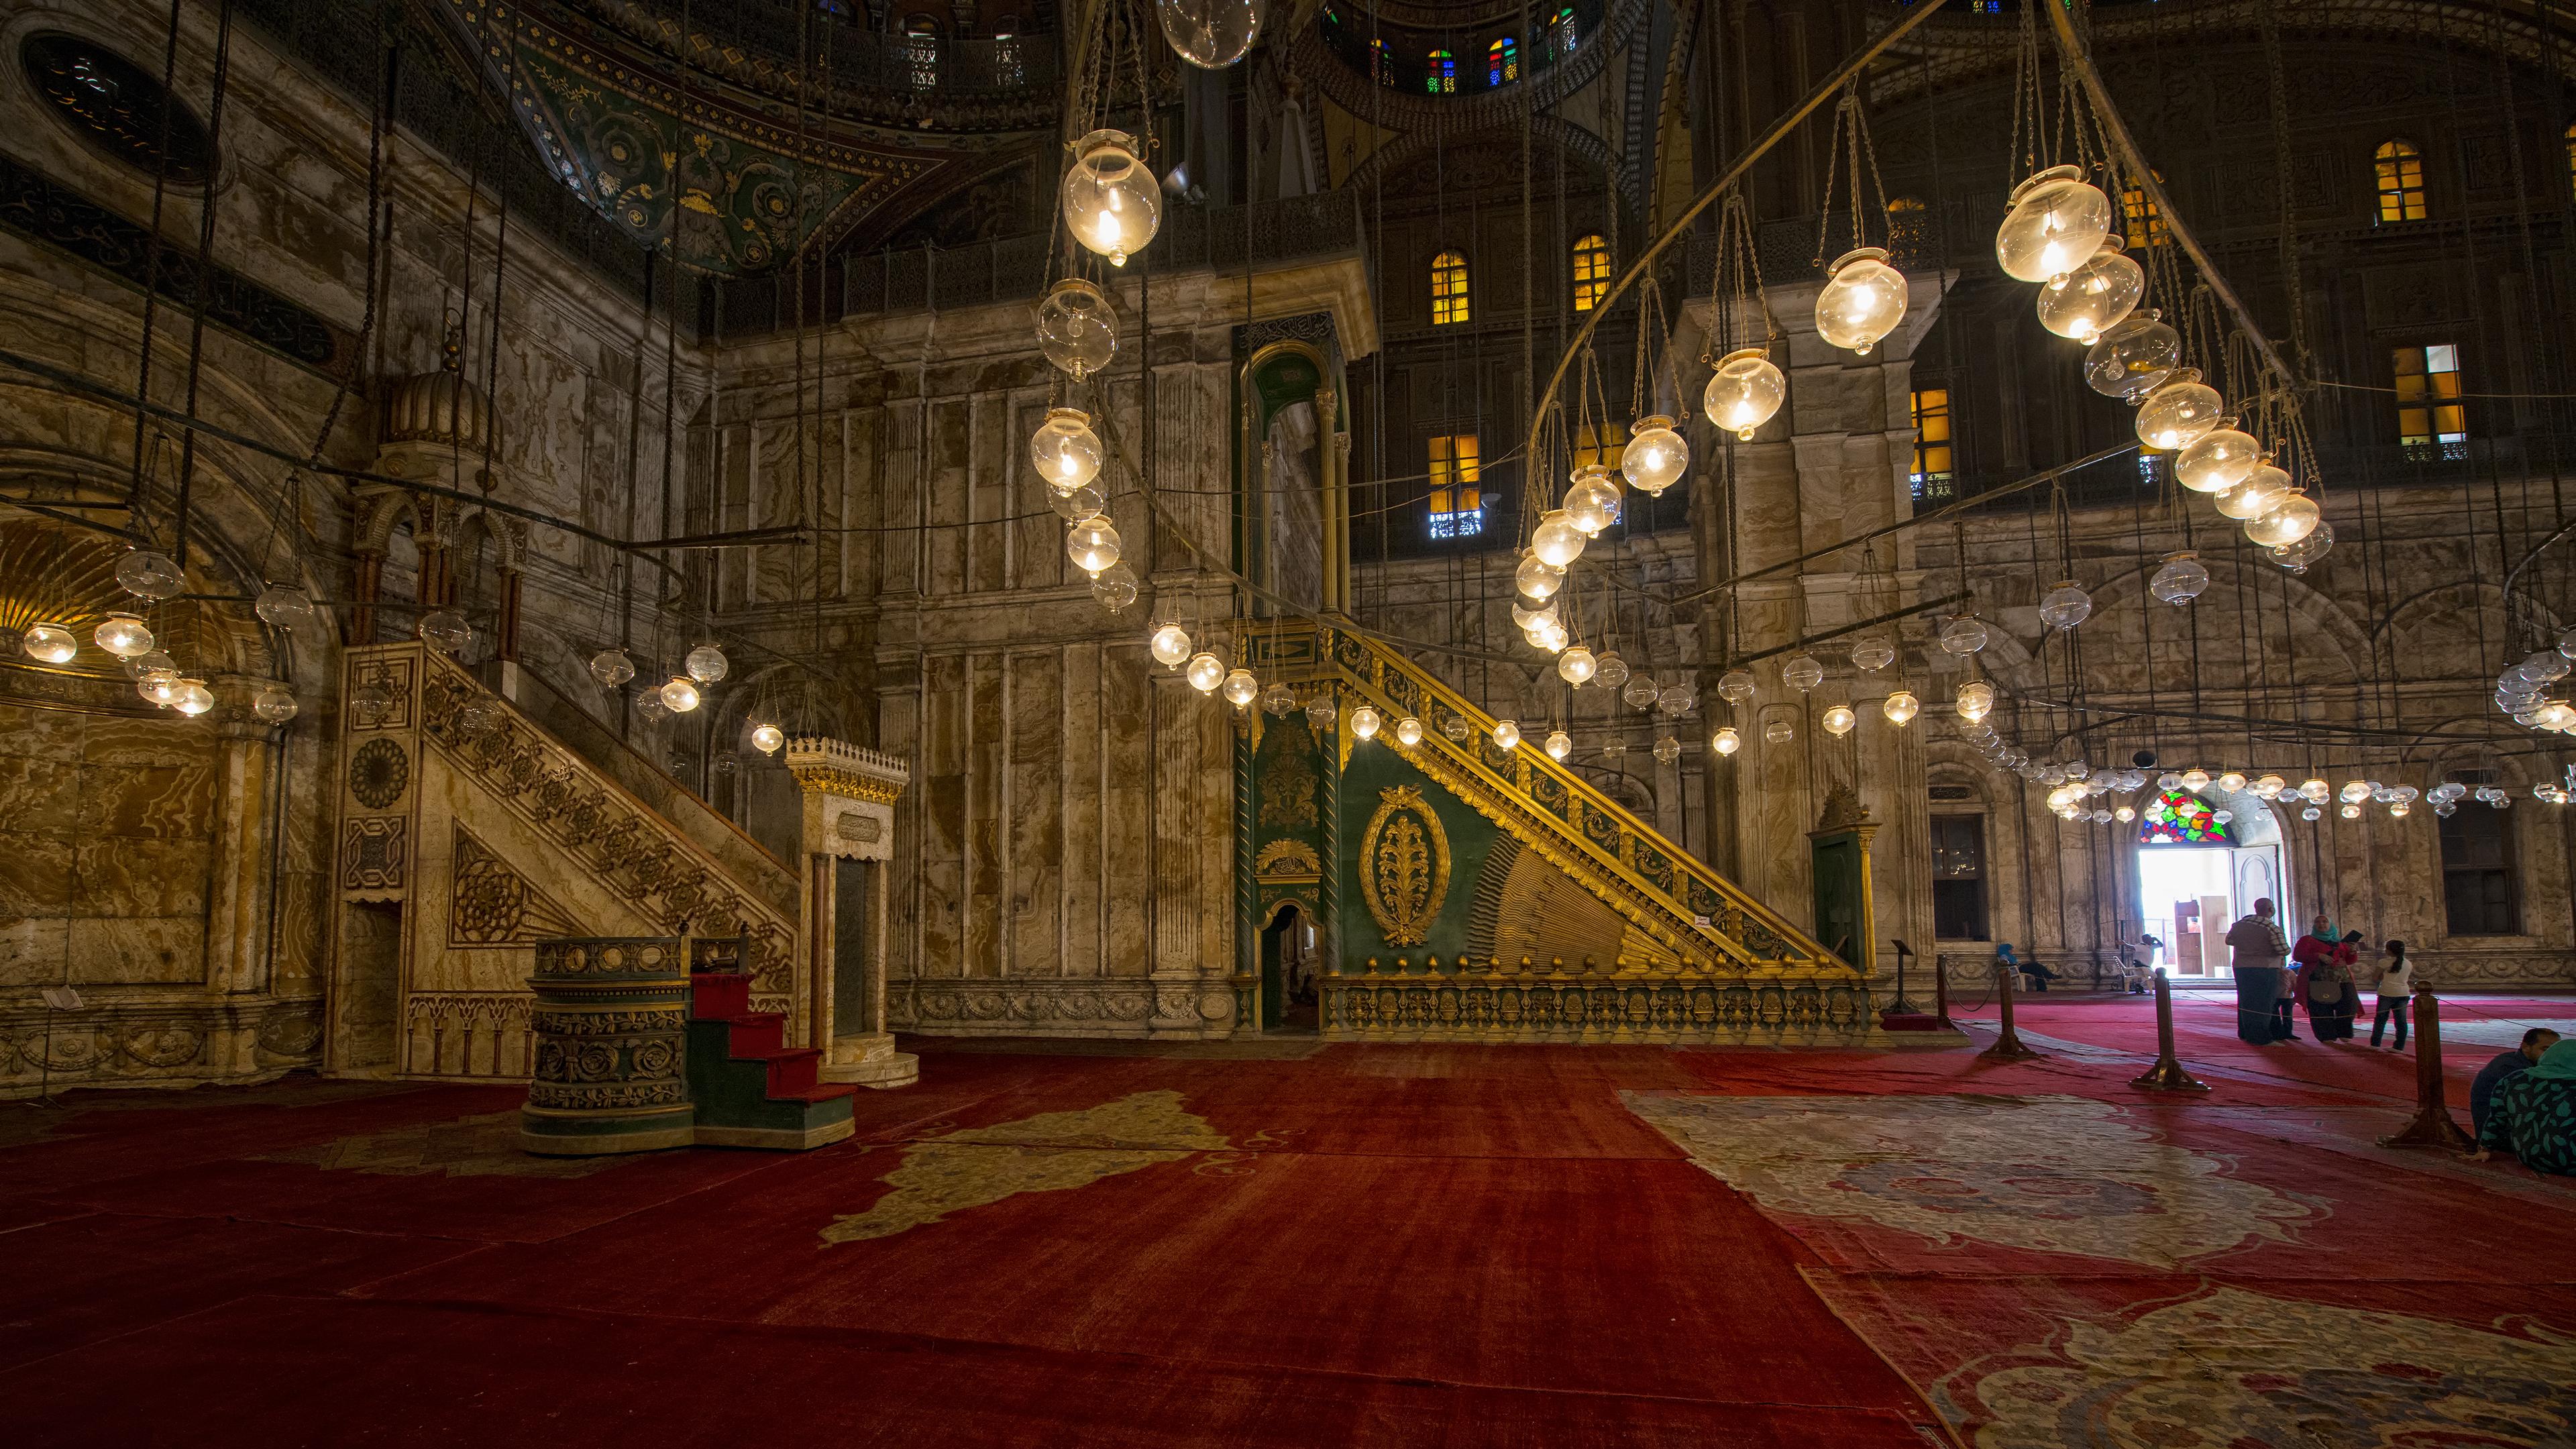 Inside the Saladin Citadel of Cairo